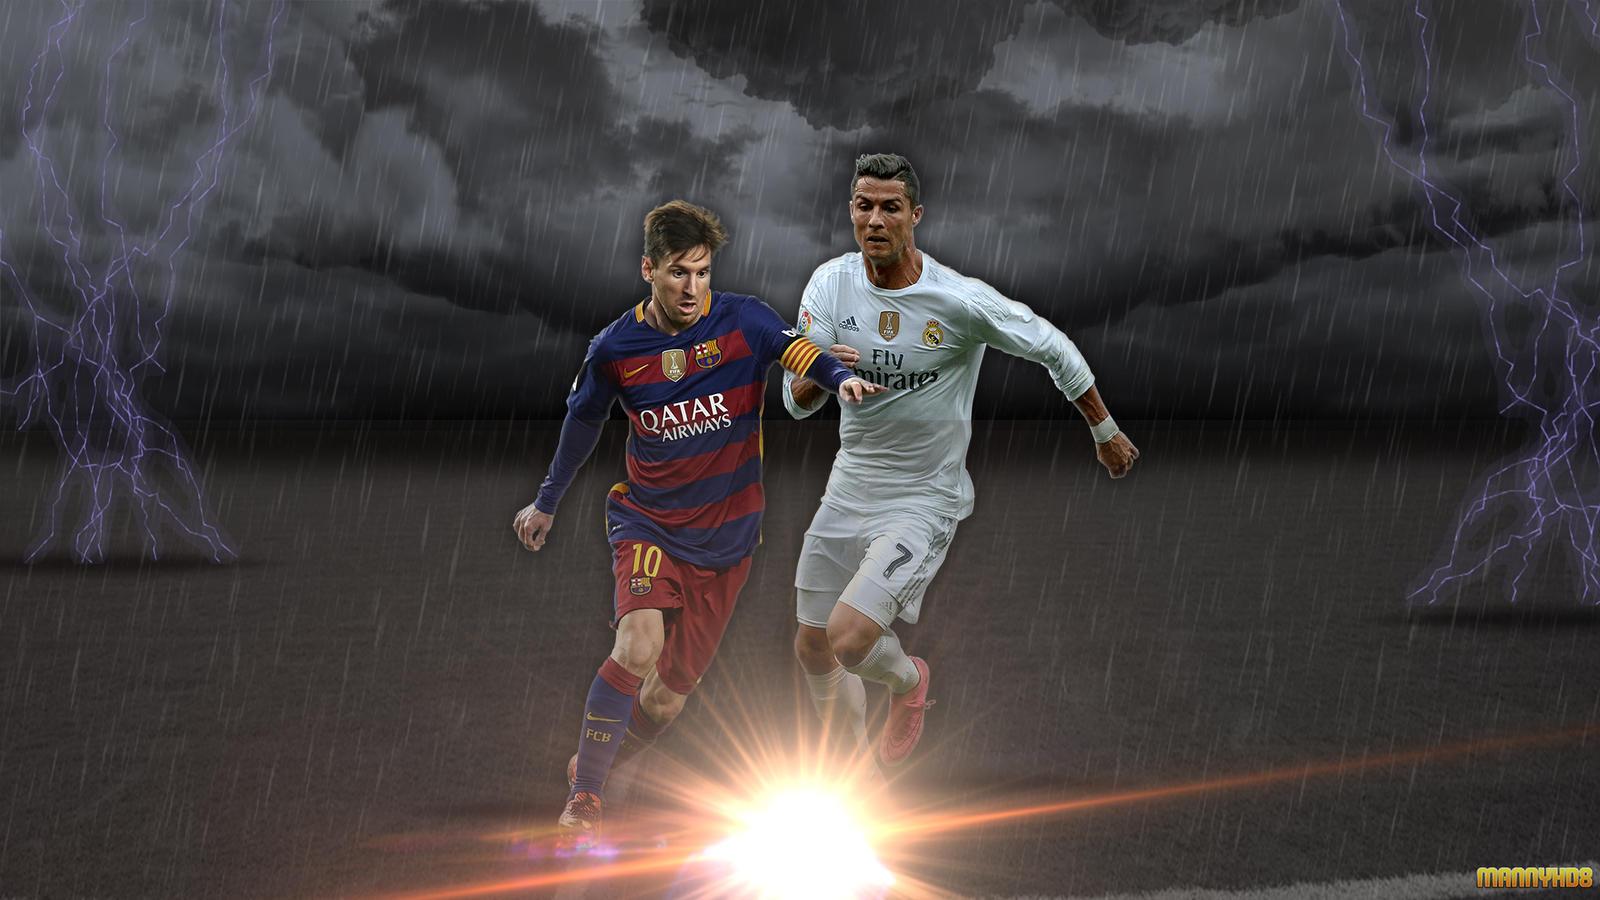 Wallpaper Messi Vs Cristiano Ronaldo 2016 By Mannyhd29 On Deviantart